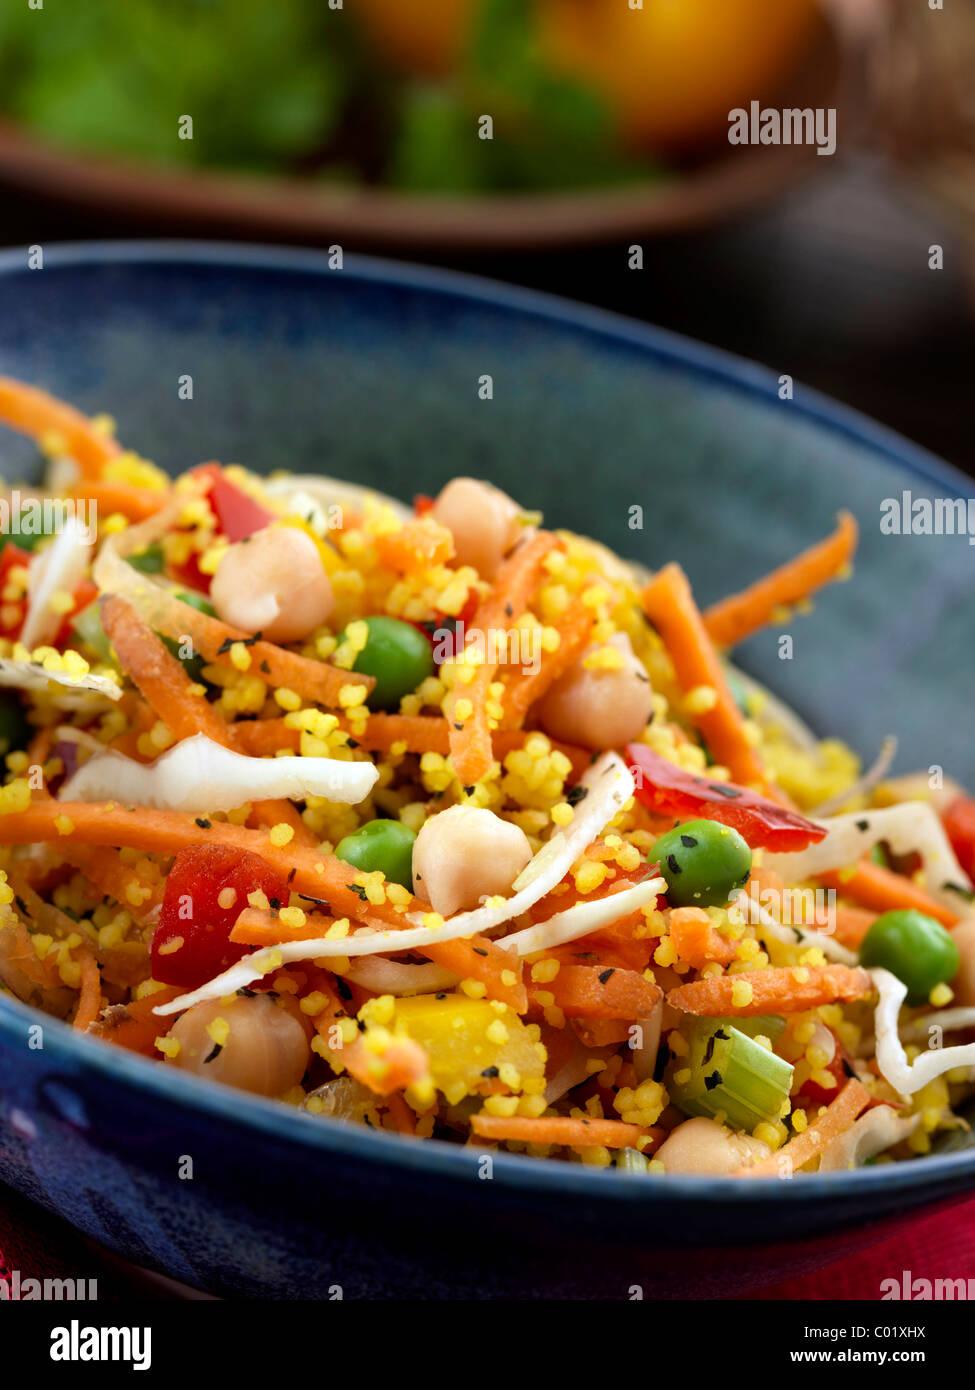 Salade de pois chiches et pois Photo Stock